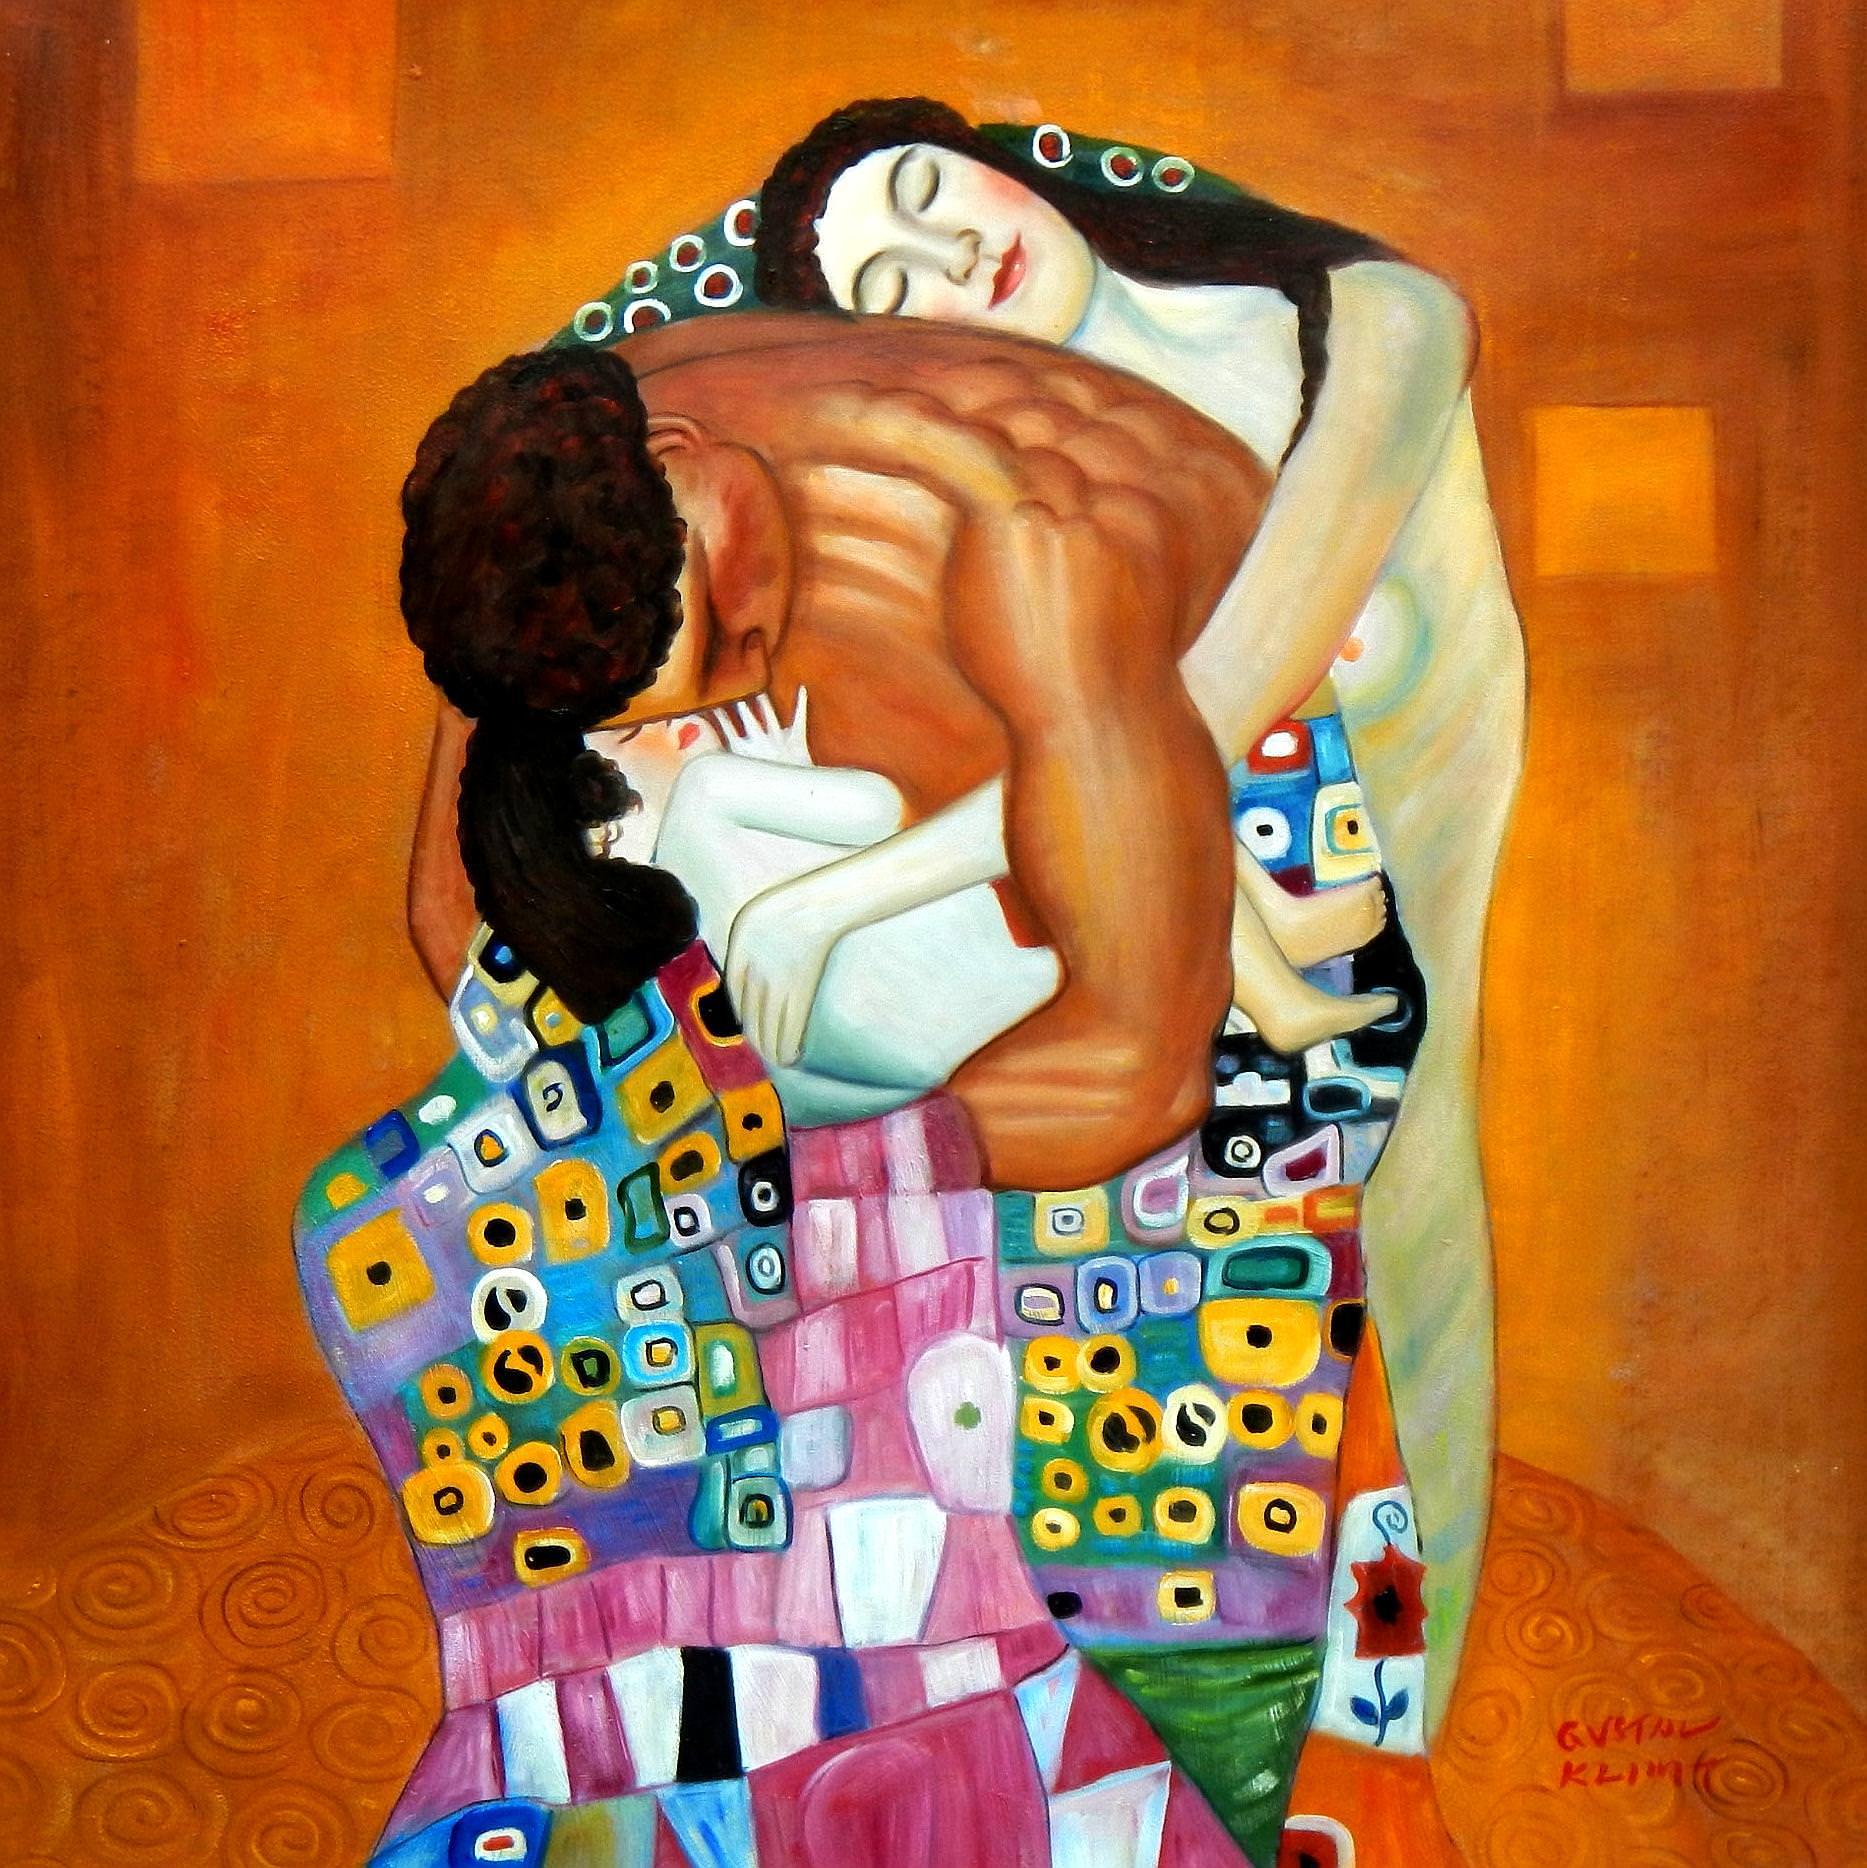 Gustav Klimt - Die Familie g92943 80x80cm Jugendstil Ölbild